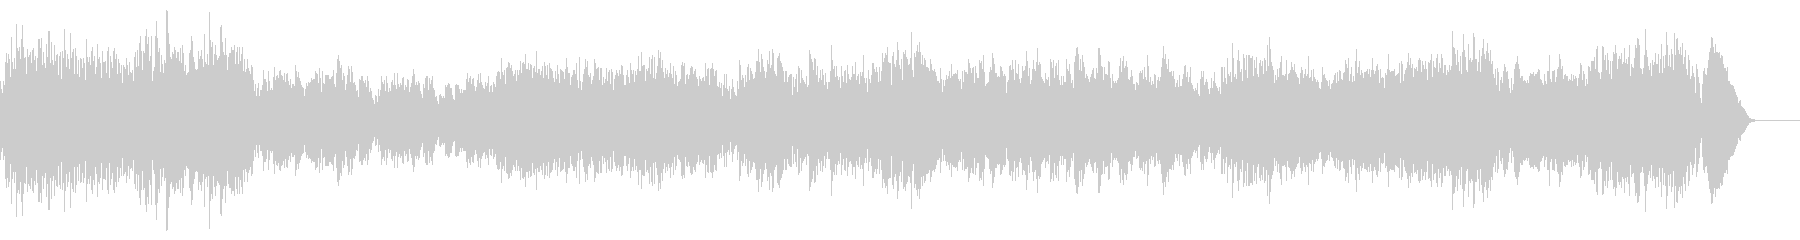 RV356_1『アレグロ』ヴィヴァルディの未再生の波形